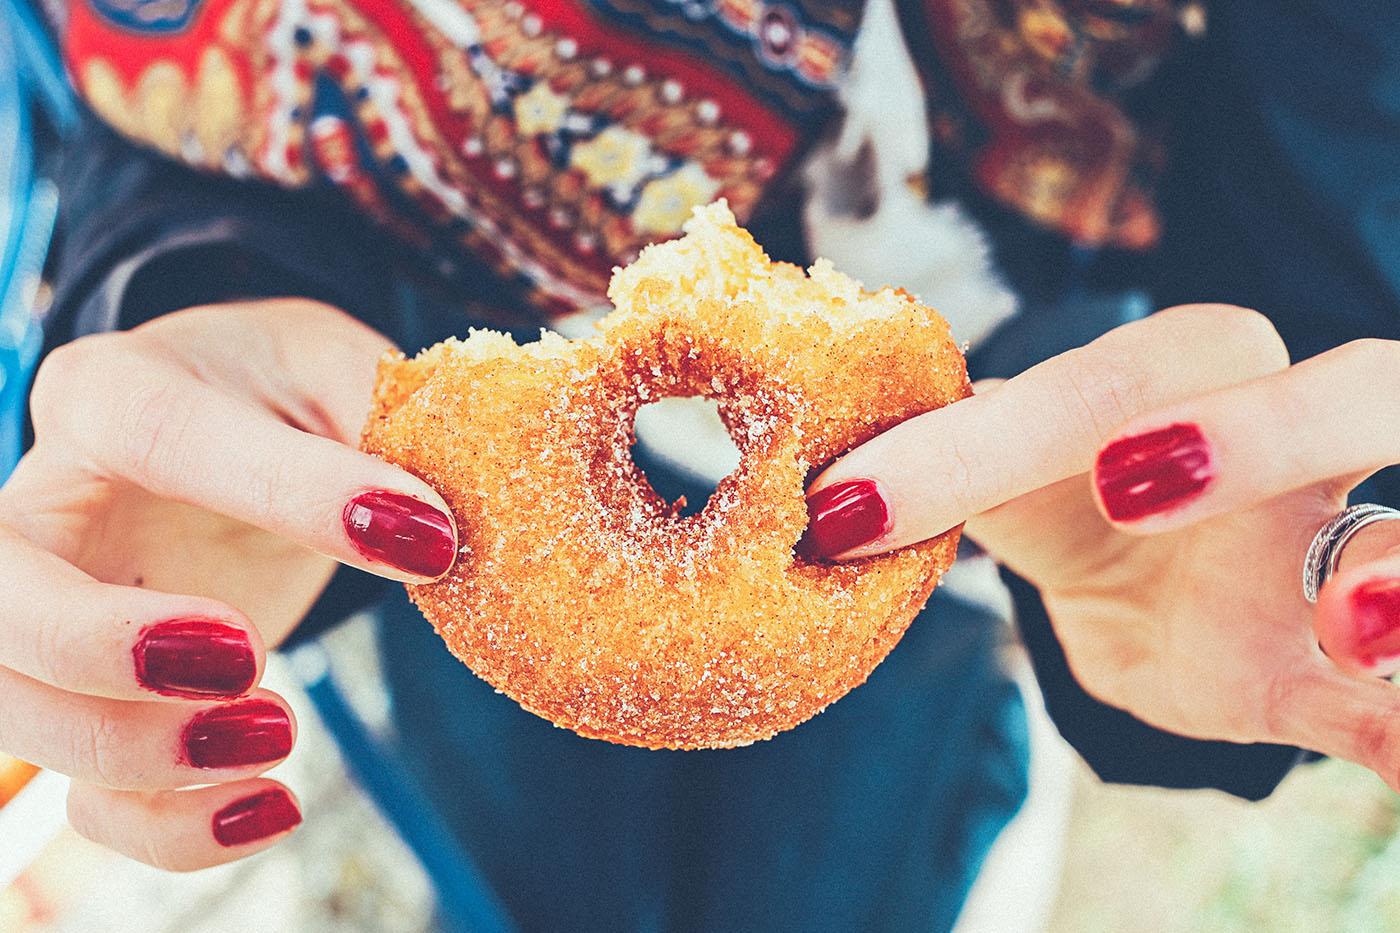 how to handle sugar cravings